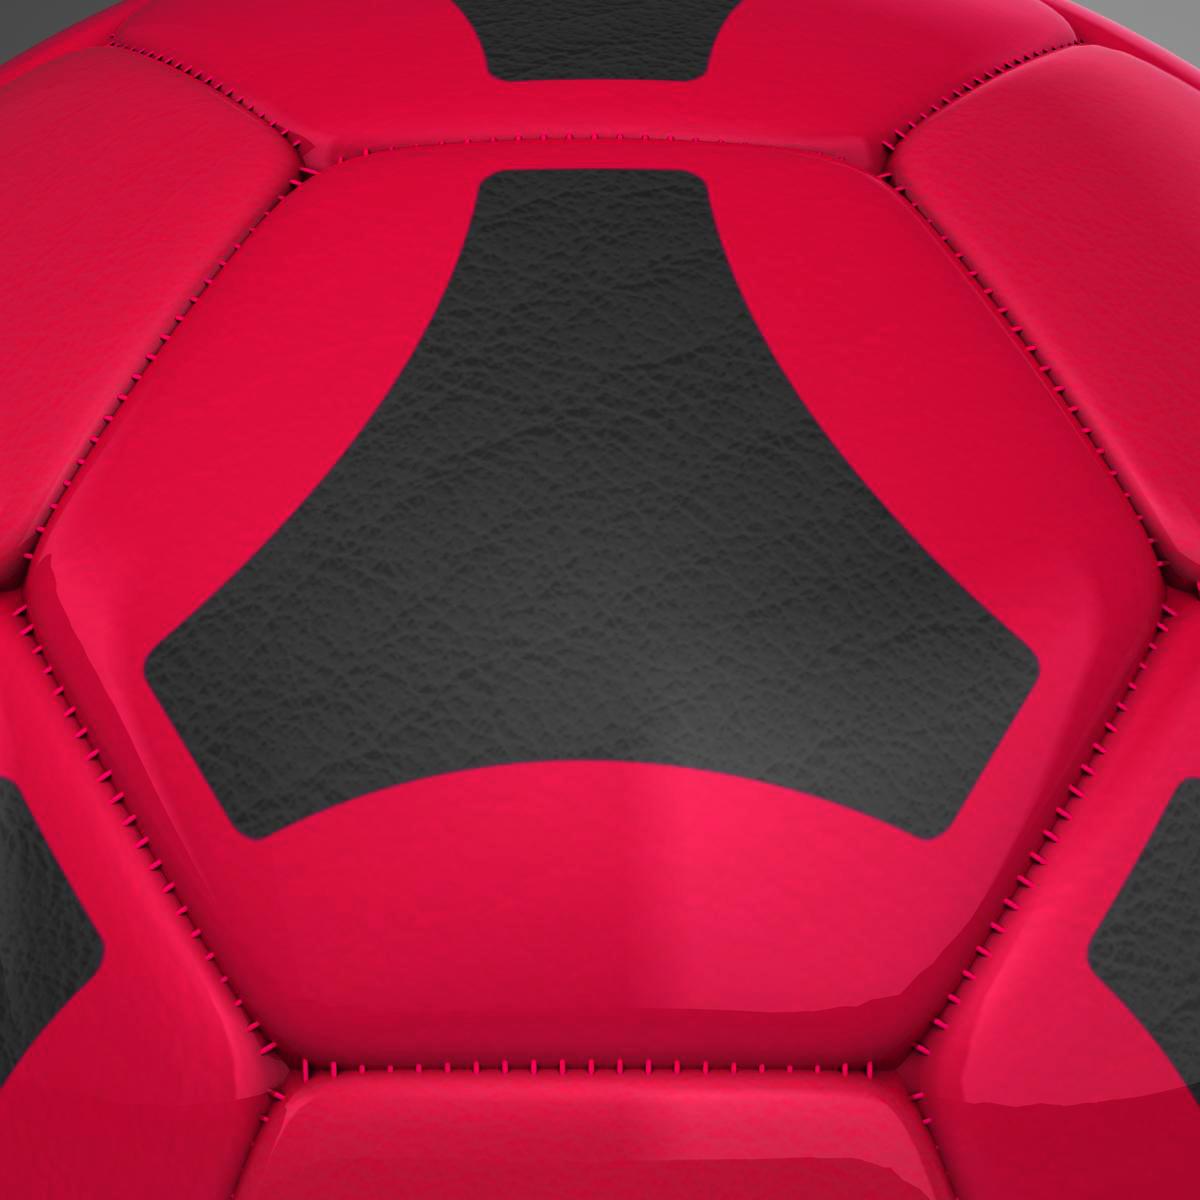 soccerball red black 3d model 3ds max fbx c4d ma mb obj 204556